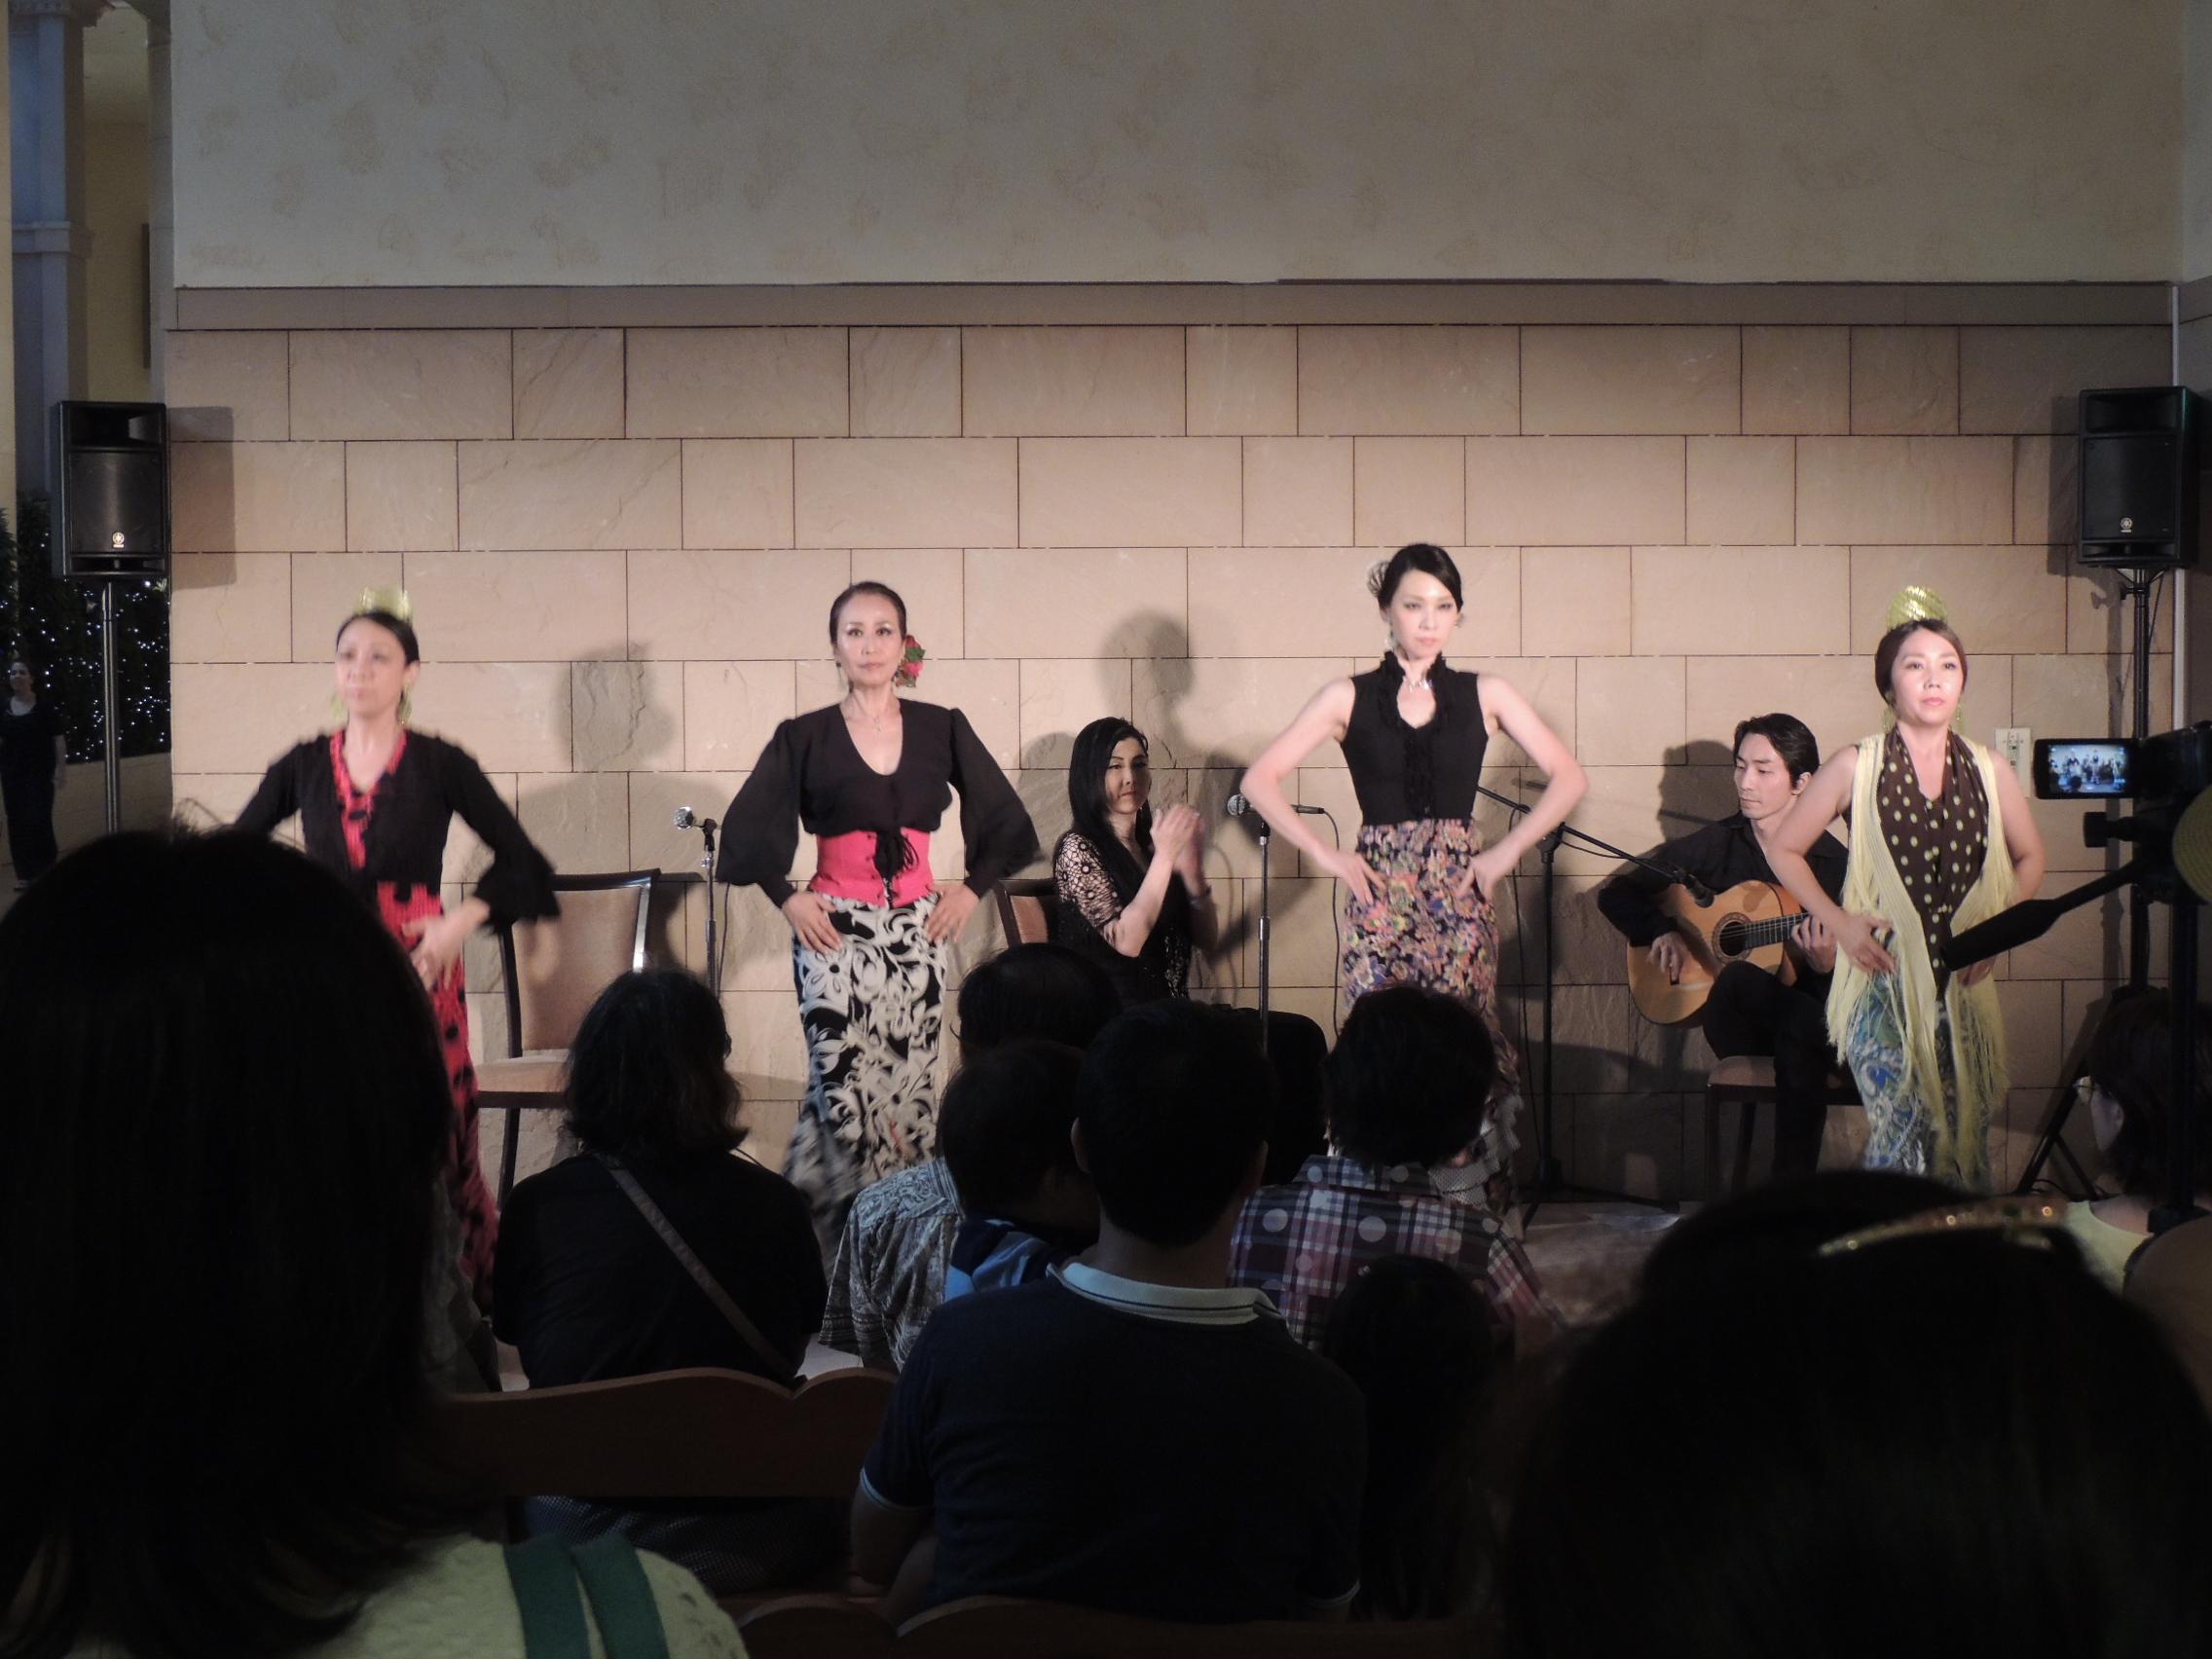 event_12.JPG